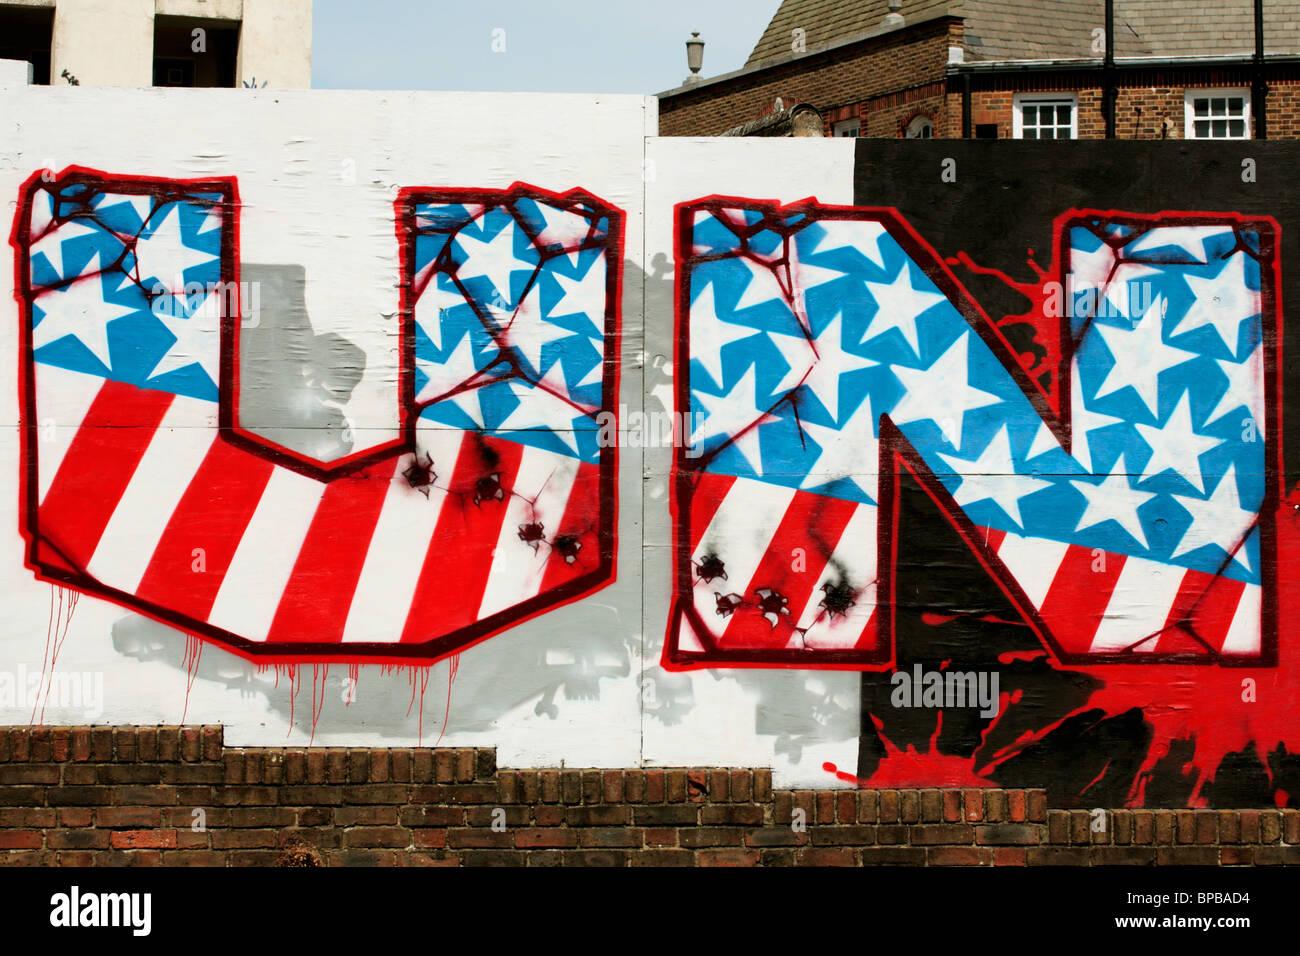 Anti American Graffiti Stock Image